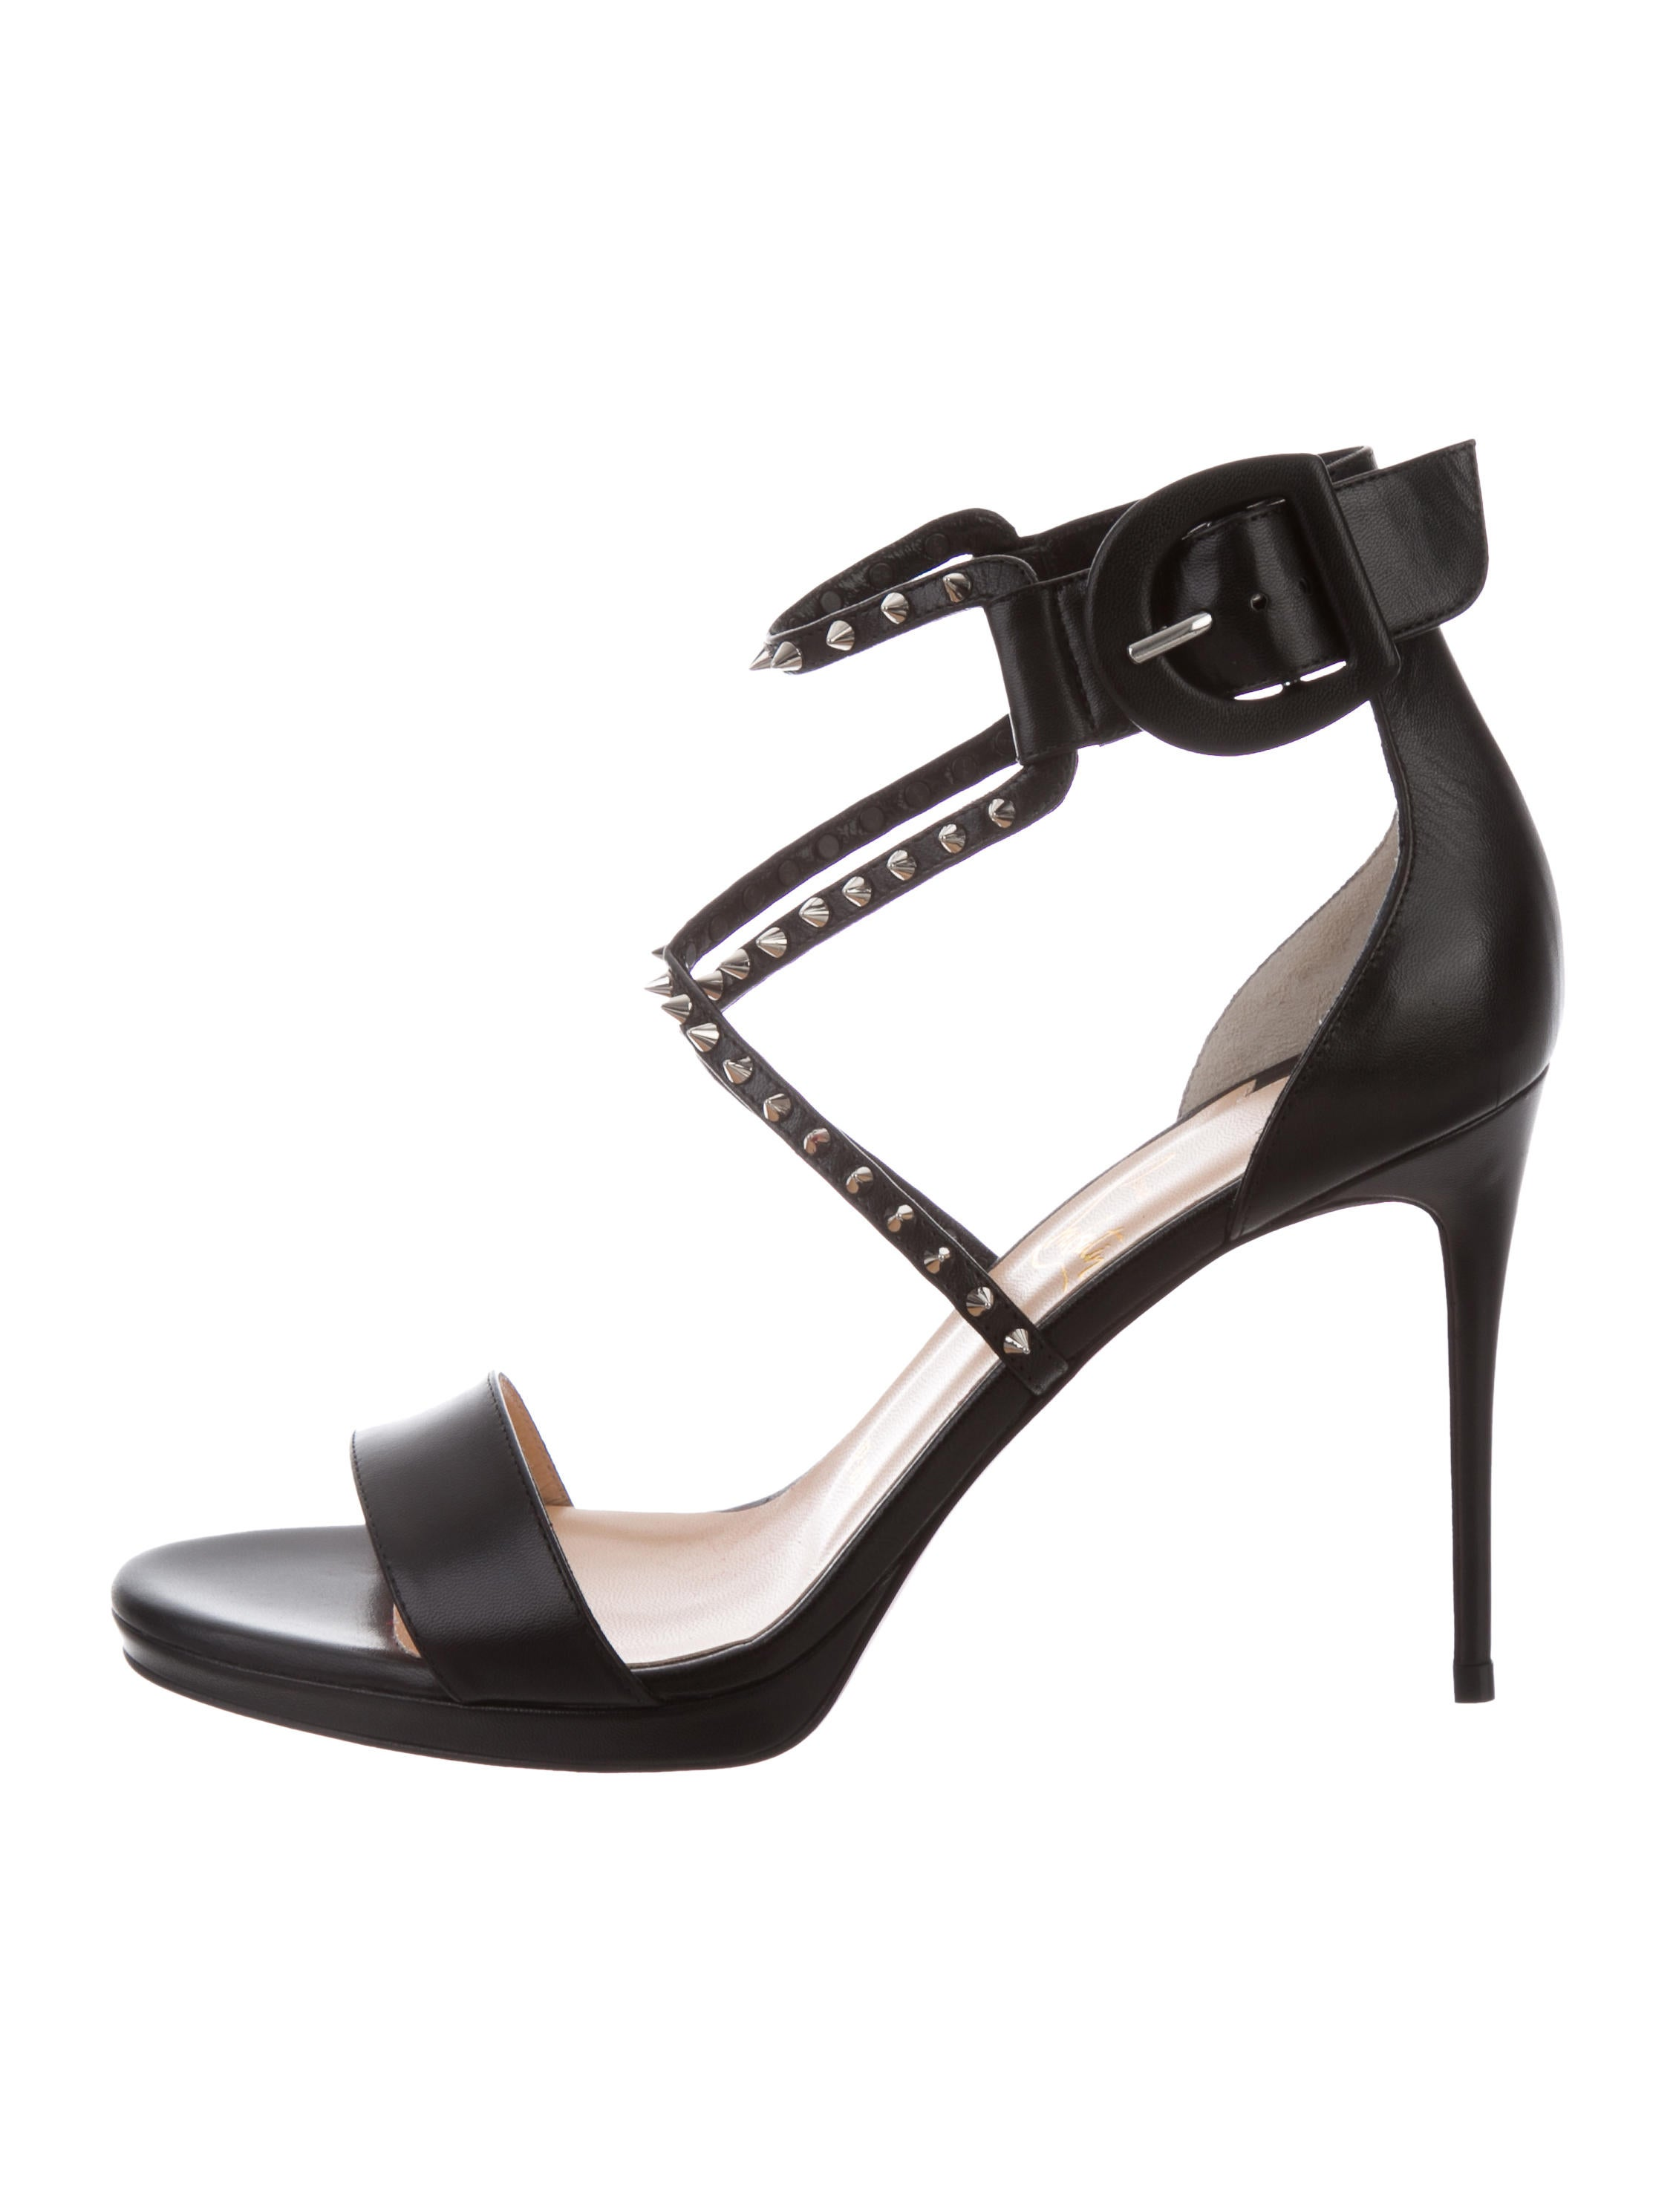 5f3157abd62 Choca Lux Studded Sandals